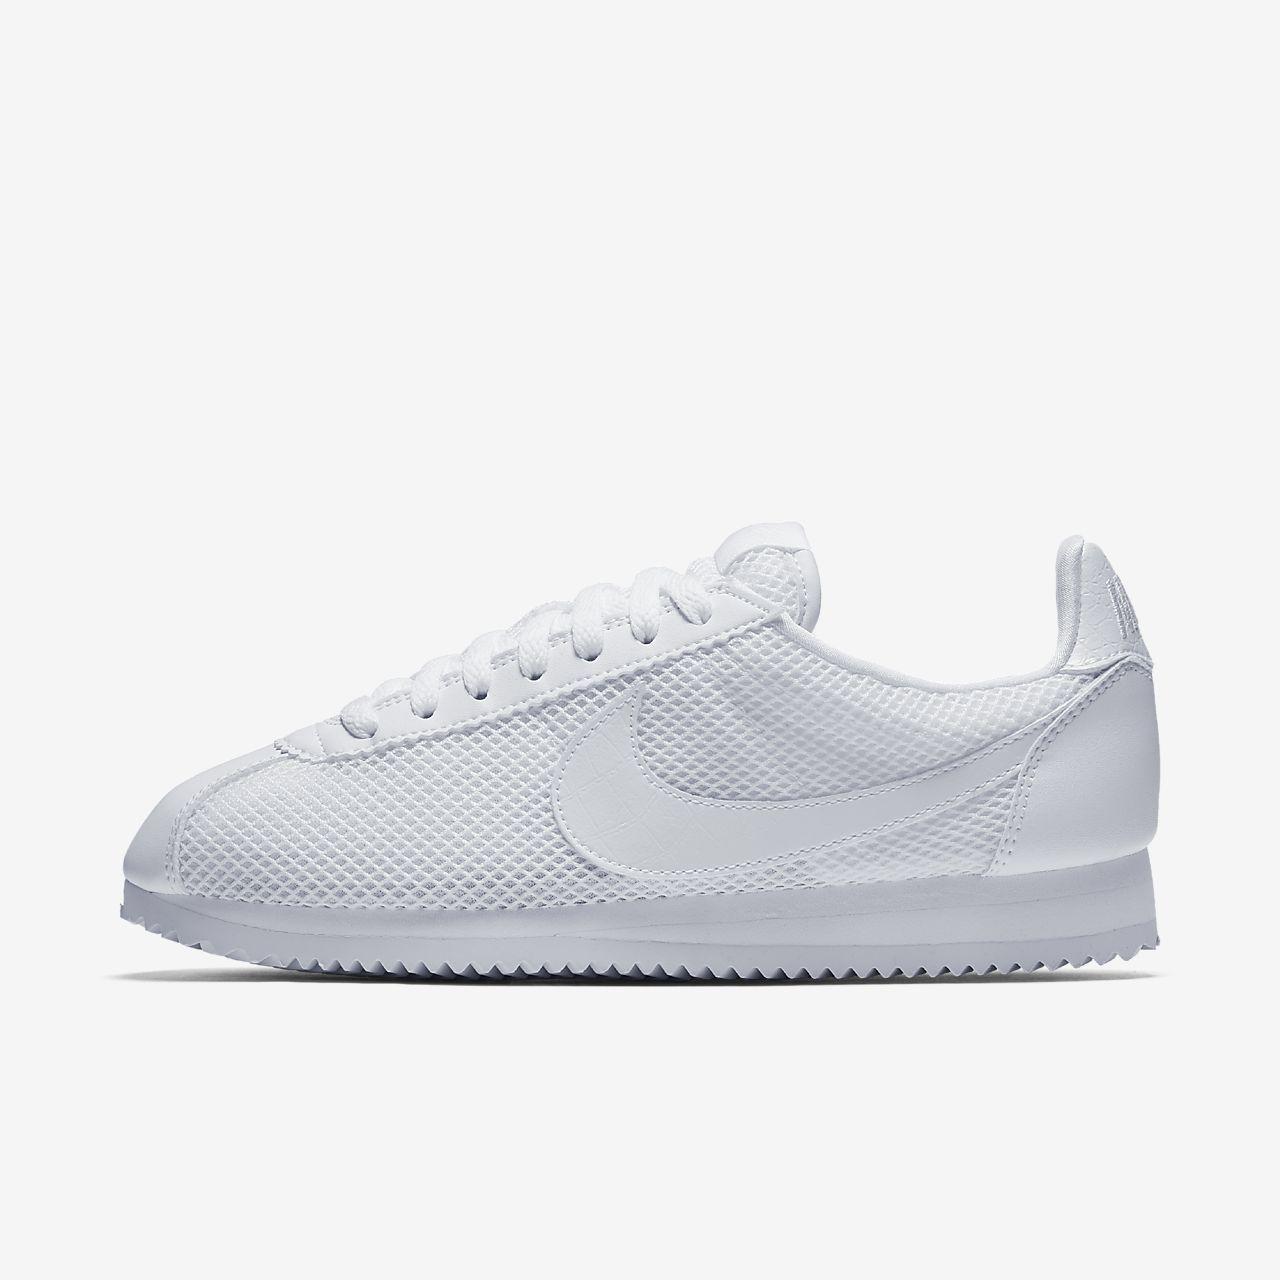 6eac8782a5d Nike Classic Cortez Premium Zapatillas - Mujer